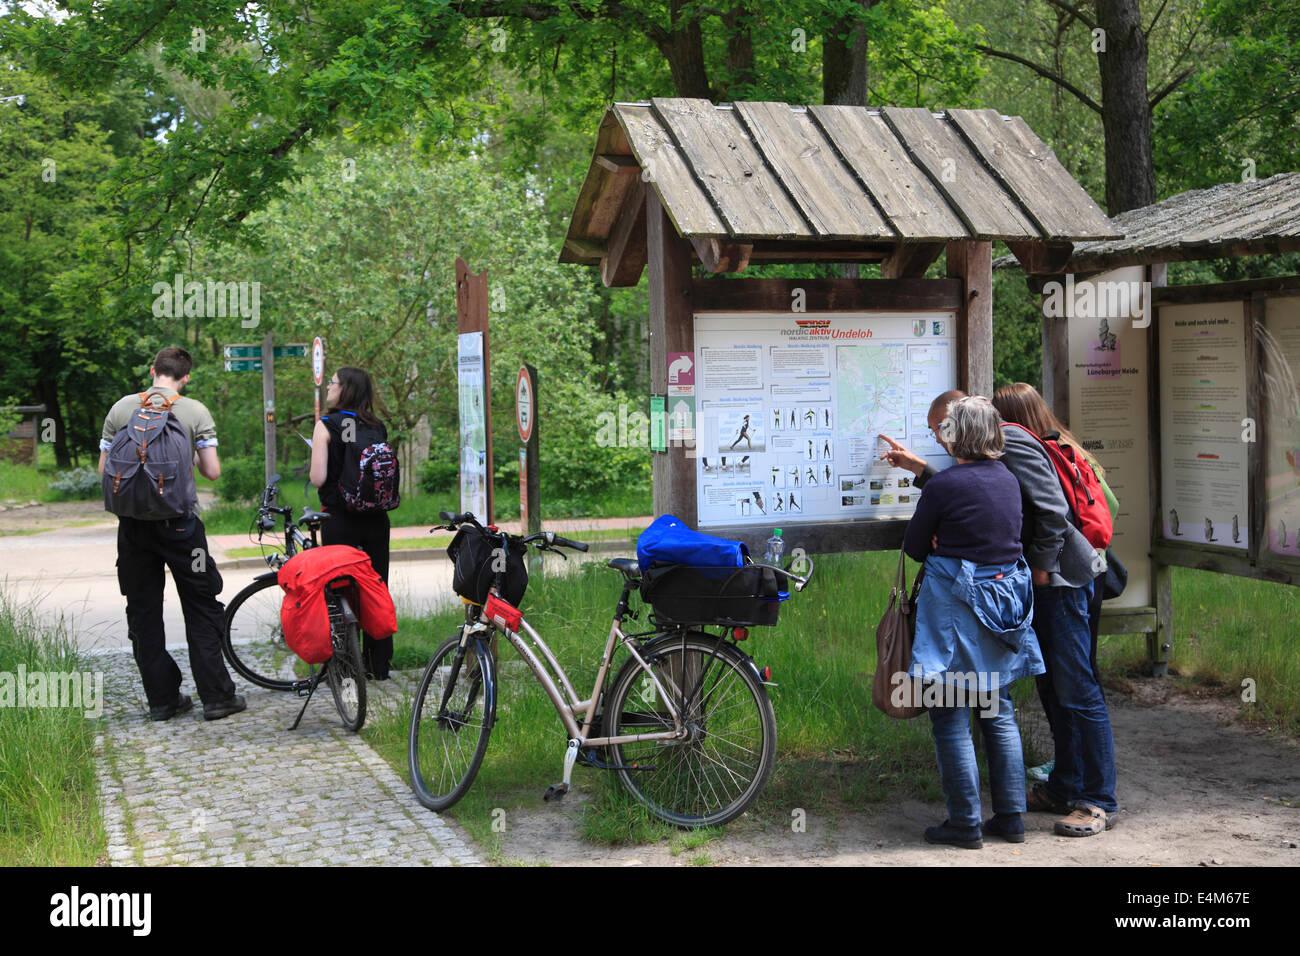 Biker in Undeloh, Lueneburger Heath, Lower Saxony, Germany, Europe - Stock Image